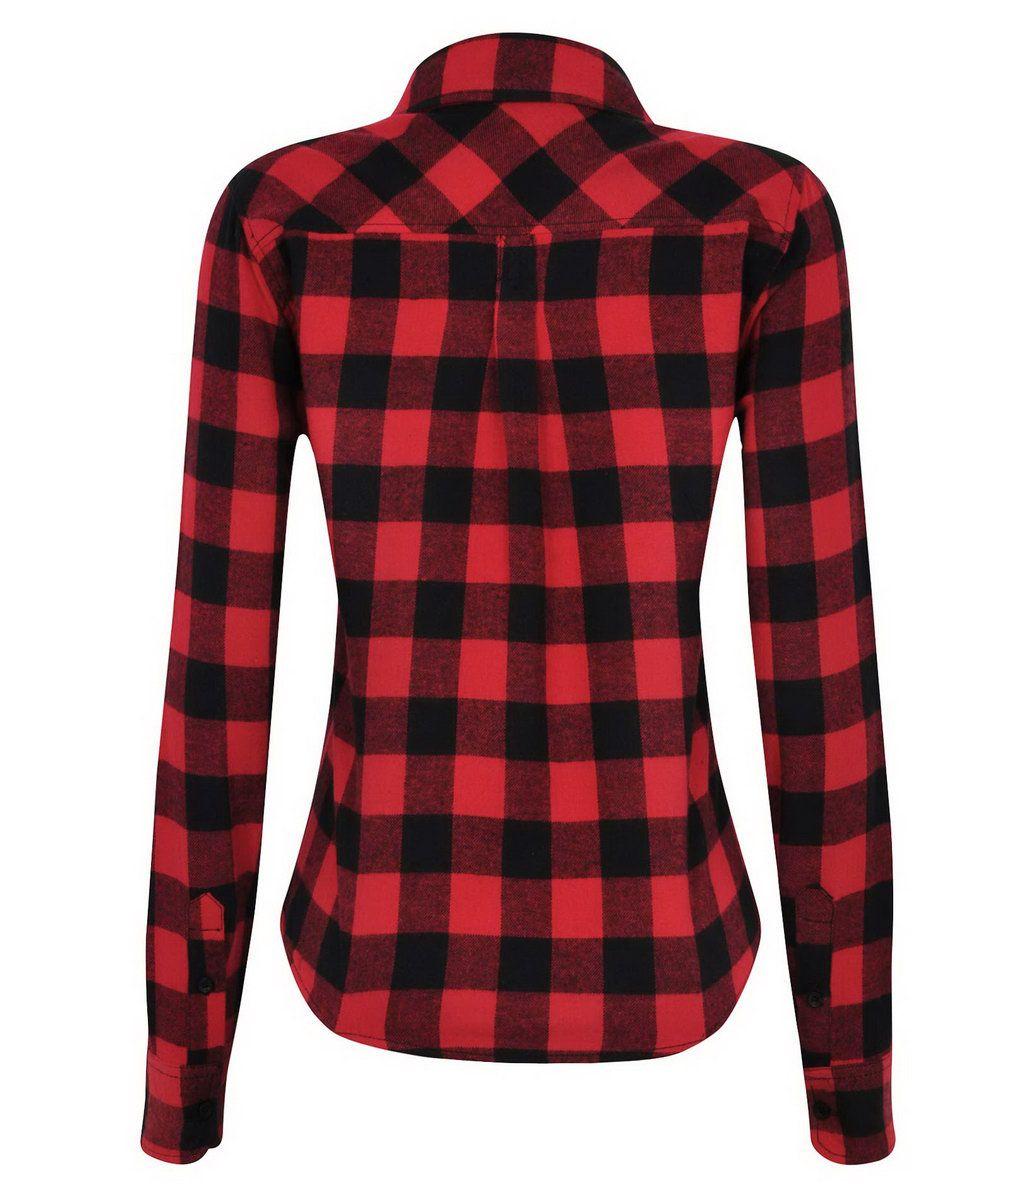 02be75608 Camisa Feminina Xadrez em Flanela - Lojas Renner